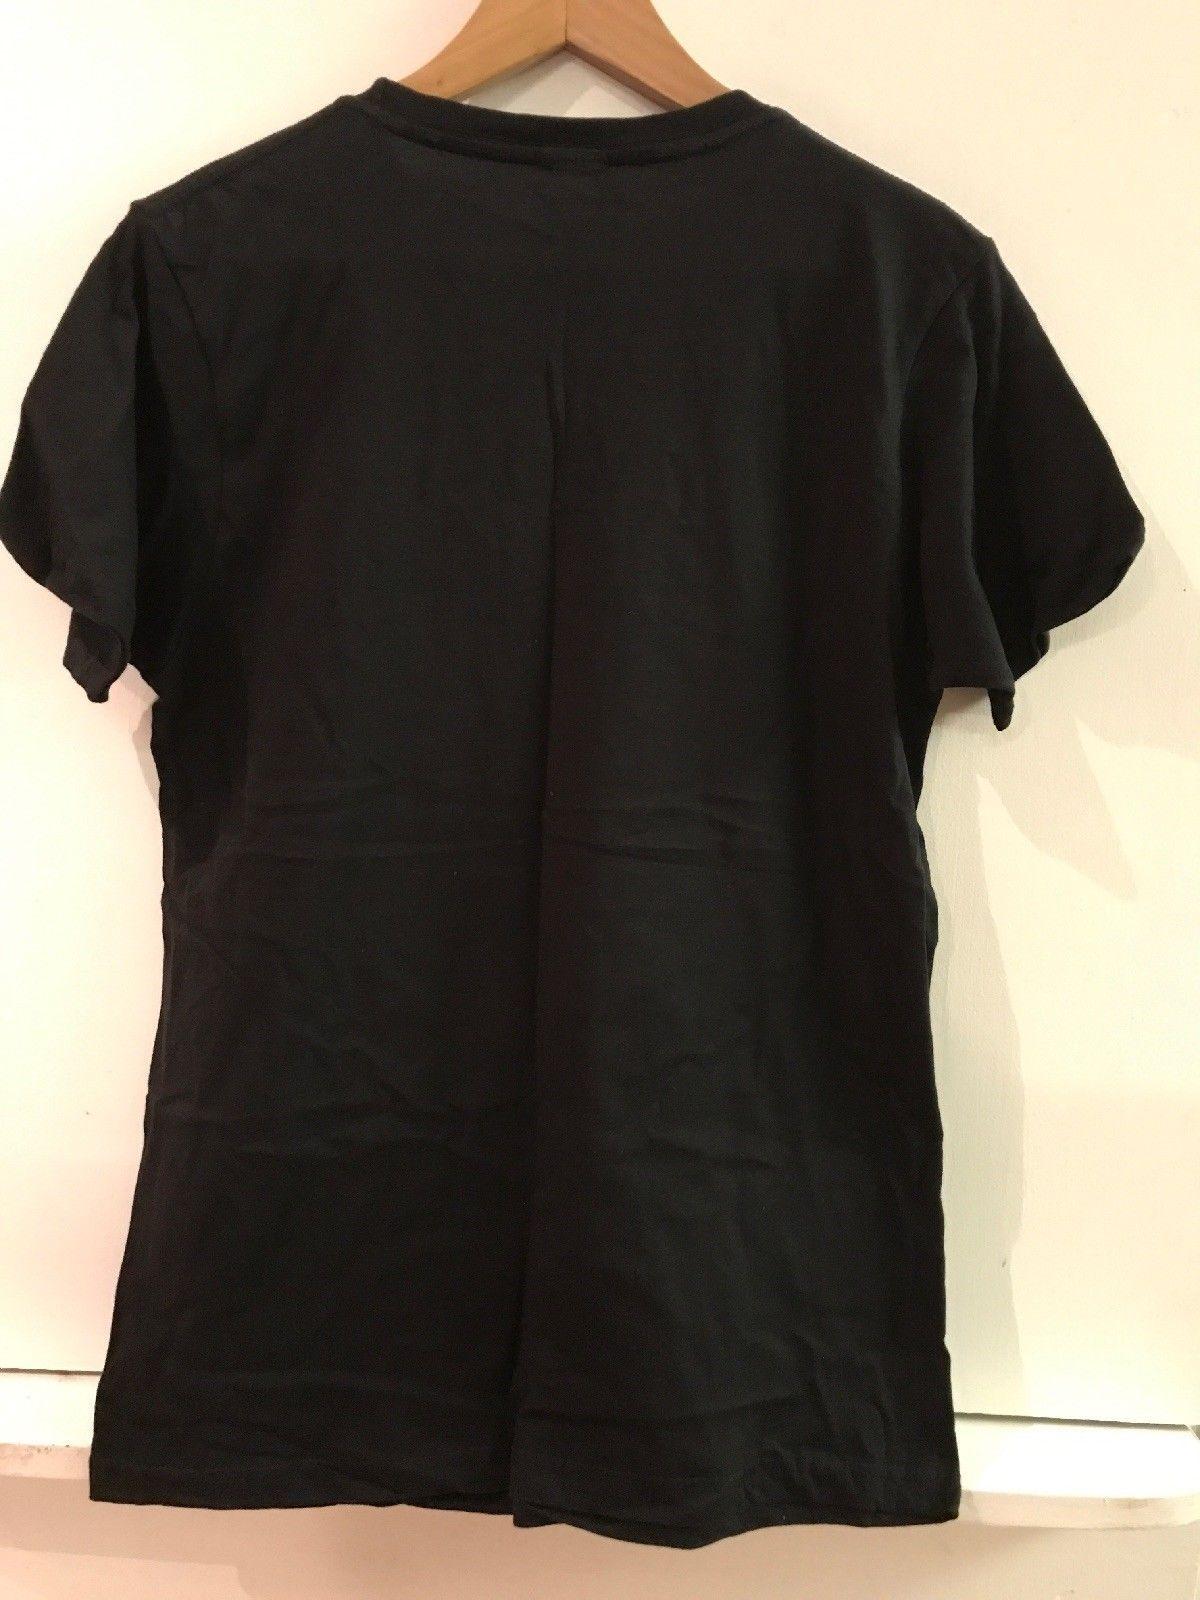 Dr. Who Tardis Black Ripple Junction Small T-Shirt